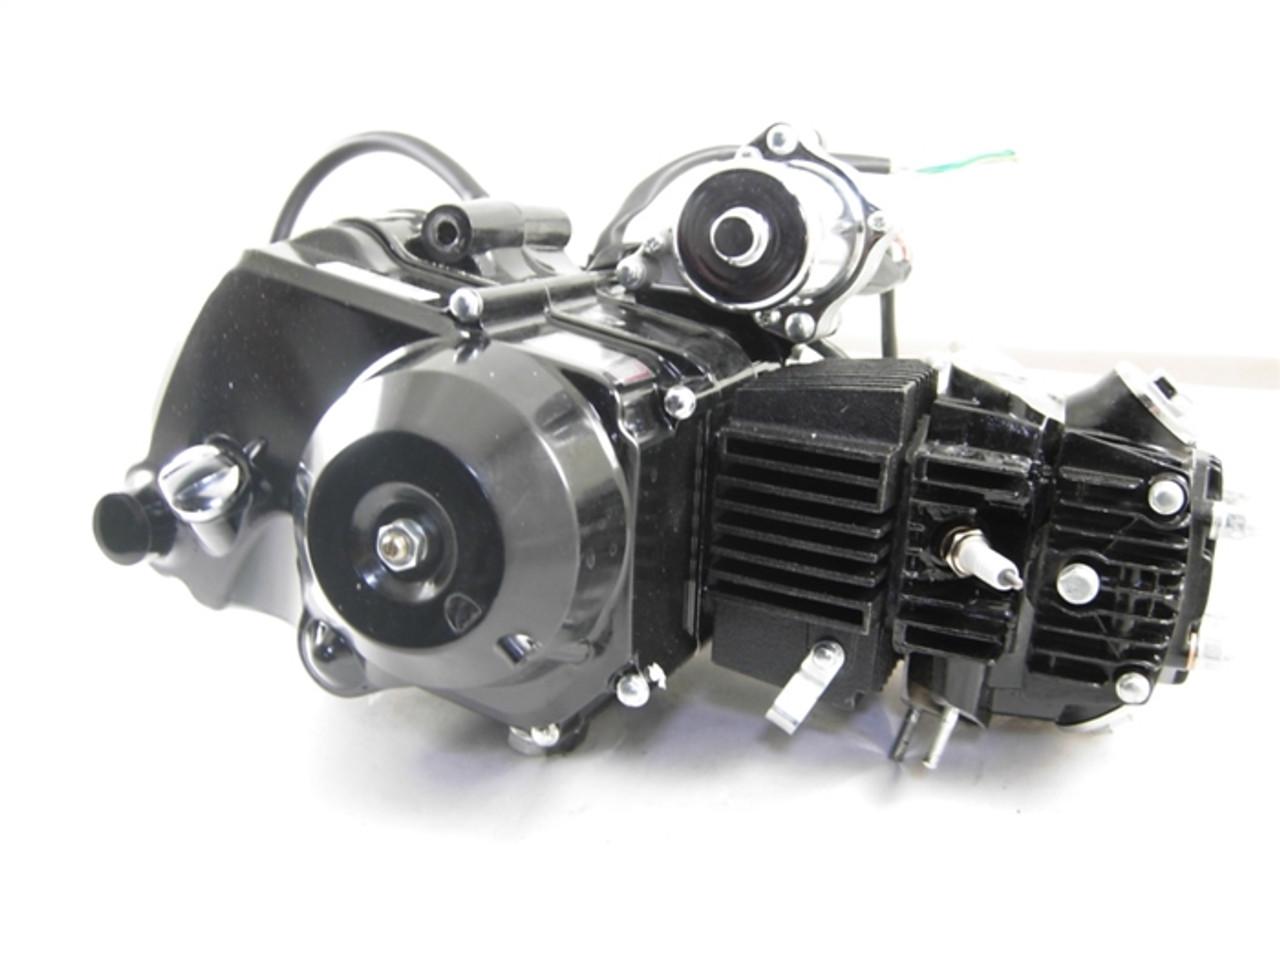 ENGINE 110 CC 3 SPEED w REVERSE 90054-9005-1